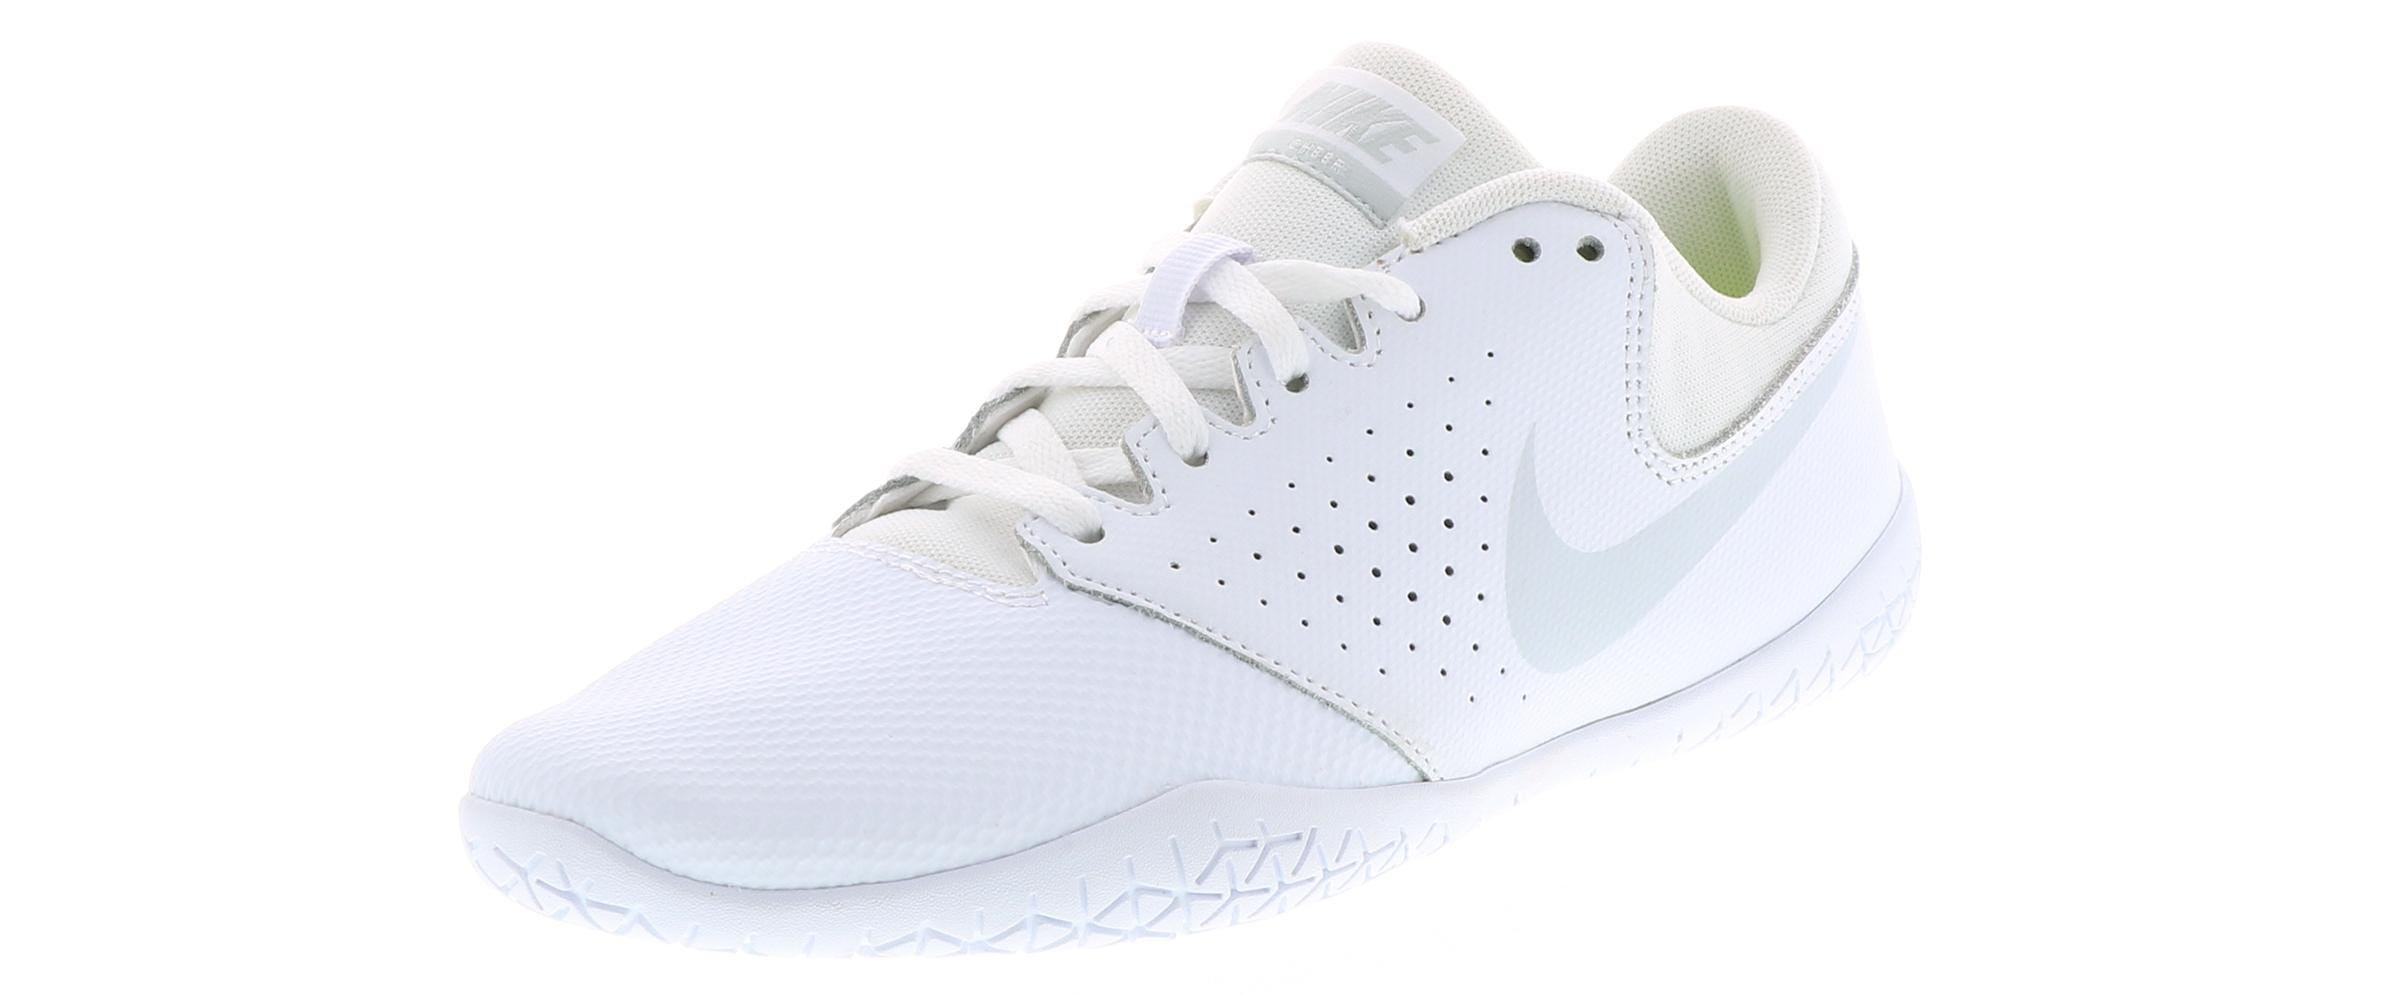 645ecbf972 Women's Nike Sideline Cheer IV